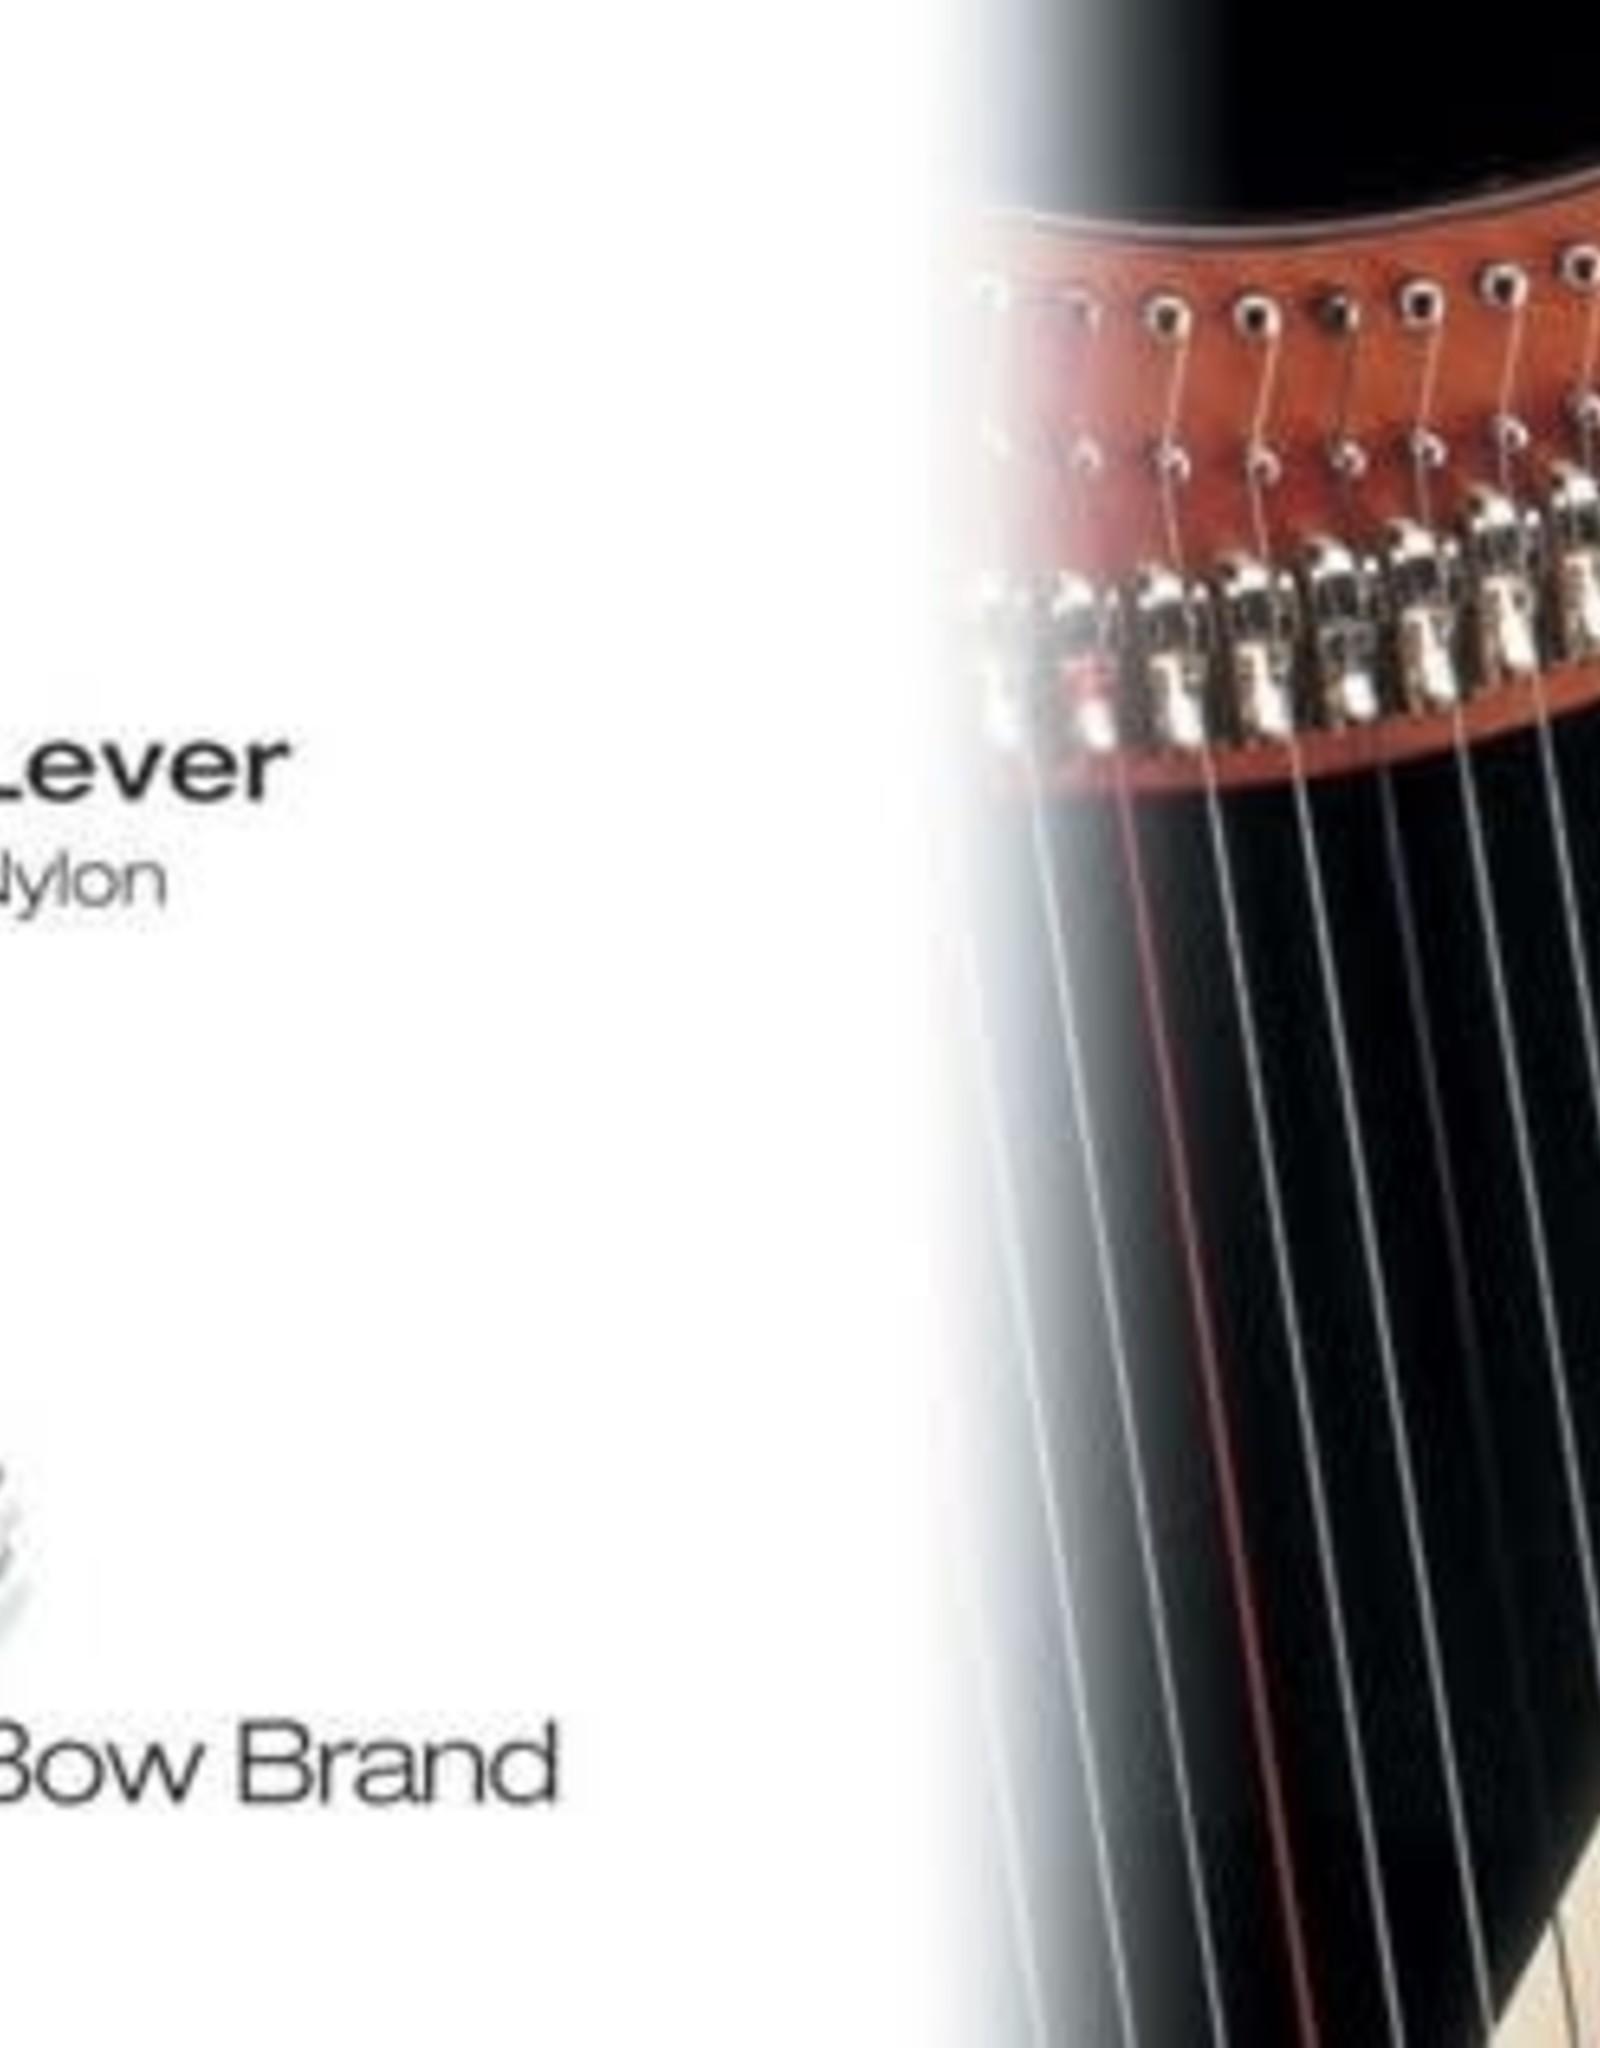 BOW BRAND  klep nylon - lever NYLON 29/4 mi